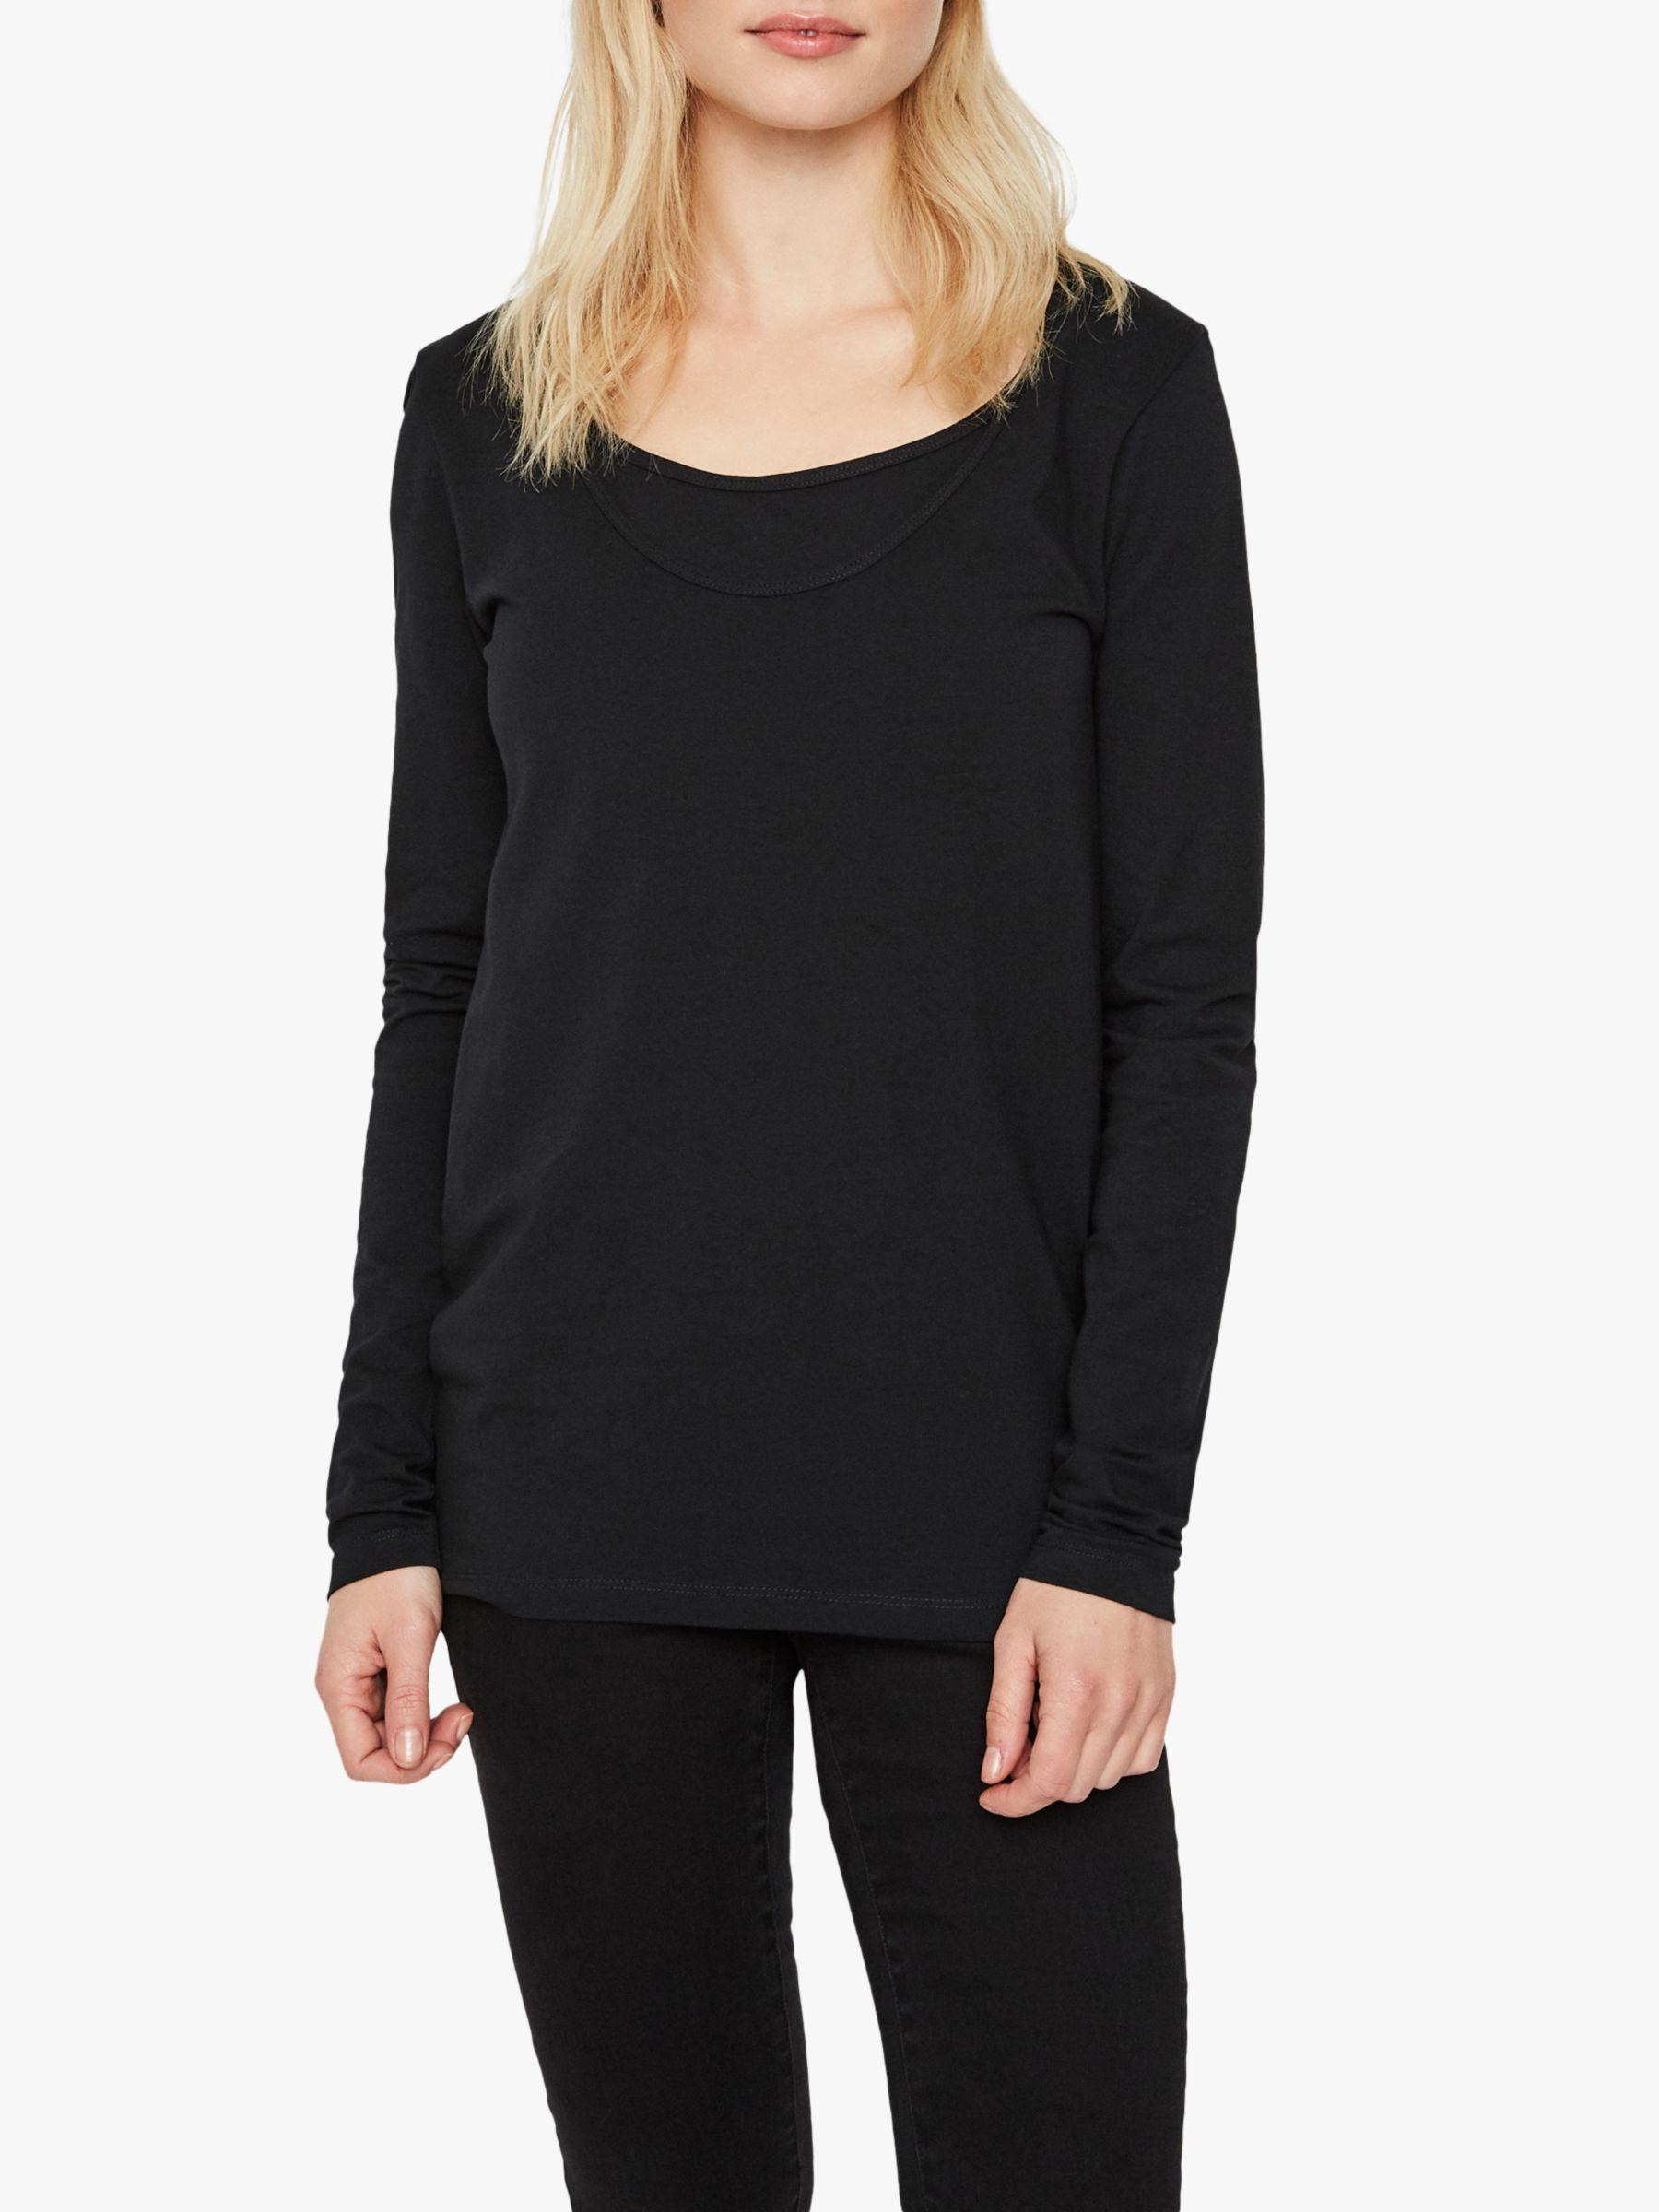 Mamalicious Mamalicious Nell Organic Cotton Long Sleeve Nursing Tops, Pack of 2, Black/Stripe